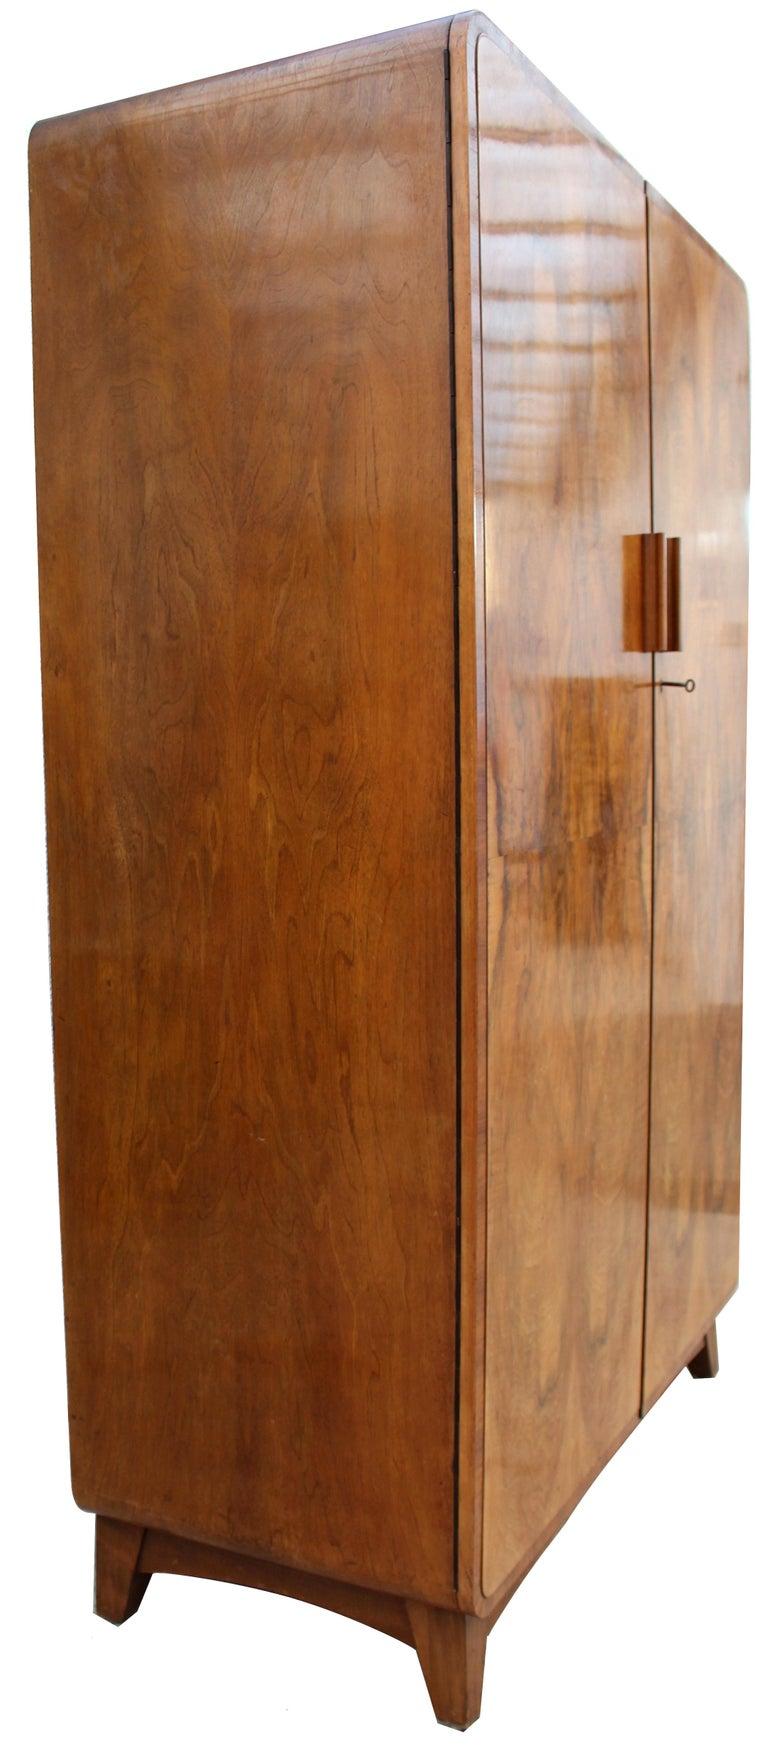 20th Century Art Deco Heavily Figured Walnut Gents Wardrobe, Tallboy, circa 1930 For Sale